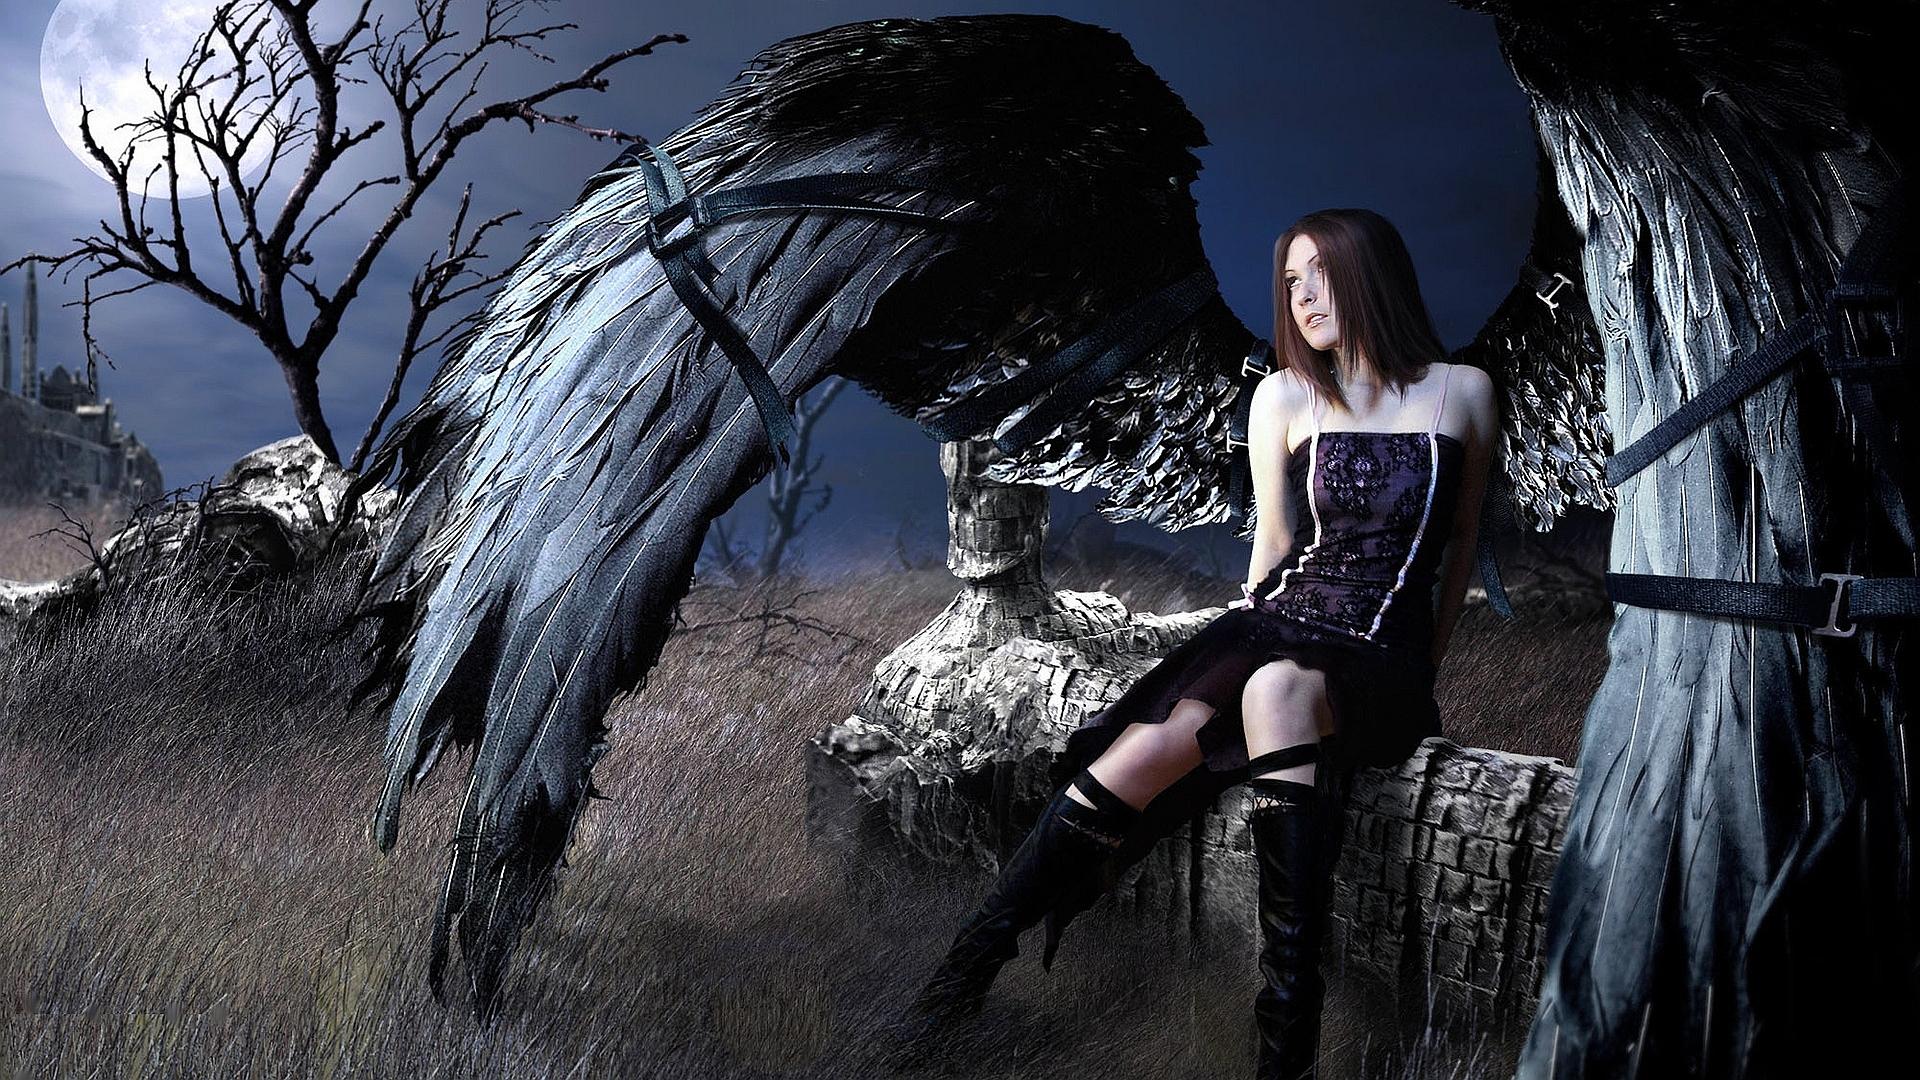 fallen angel Wallpaper Background 28674 1920x1080